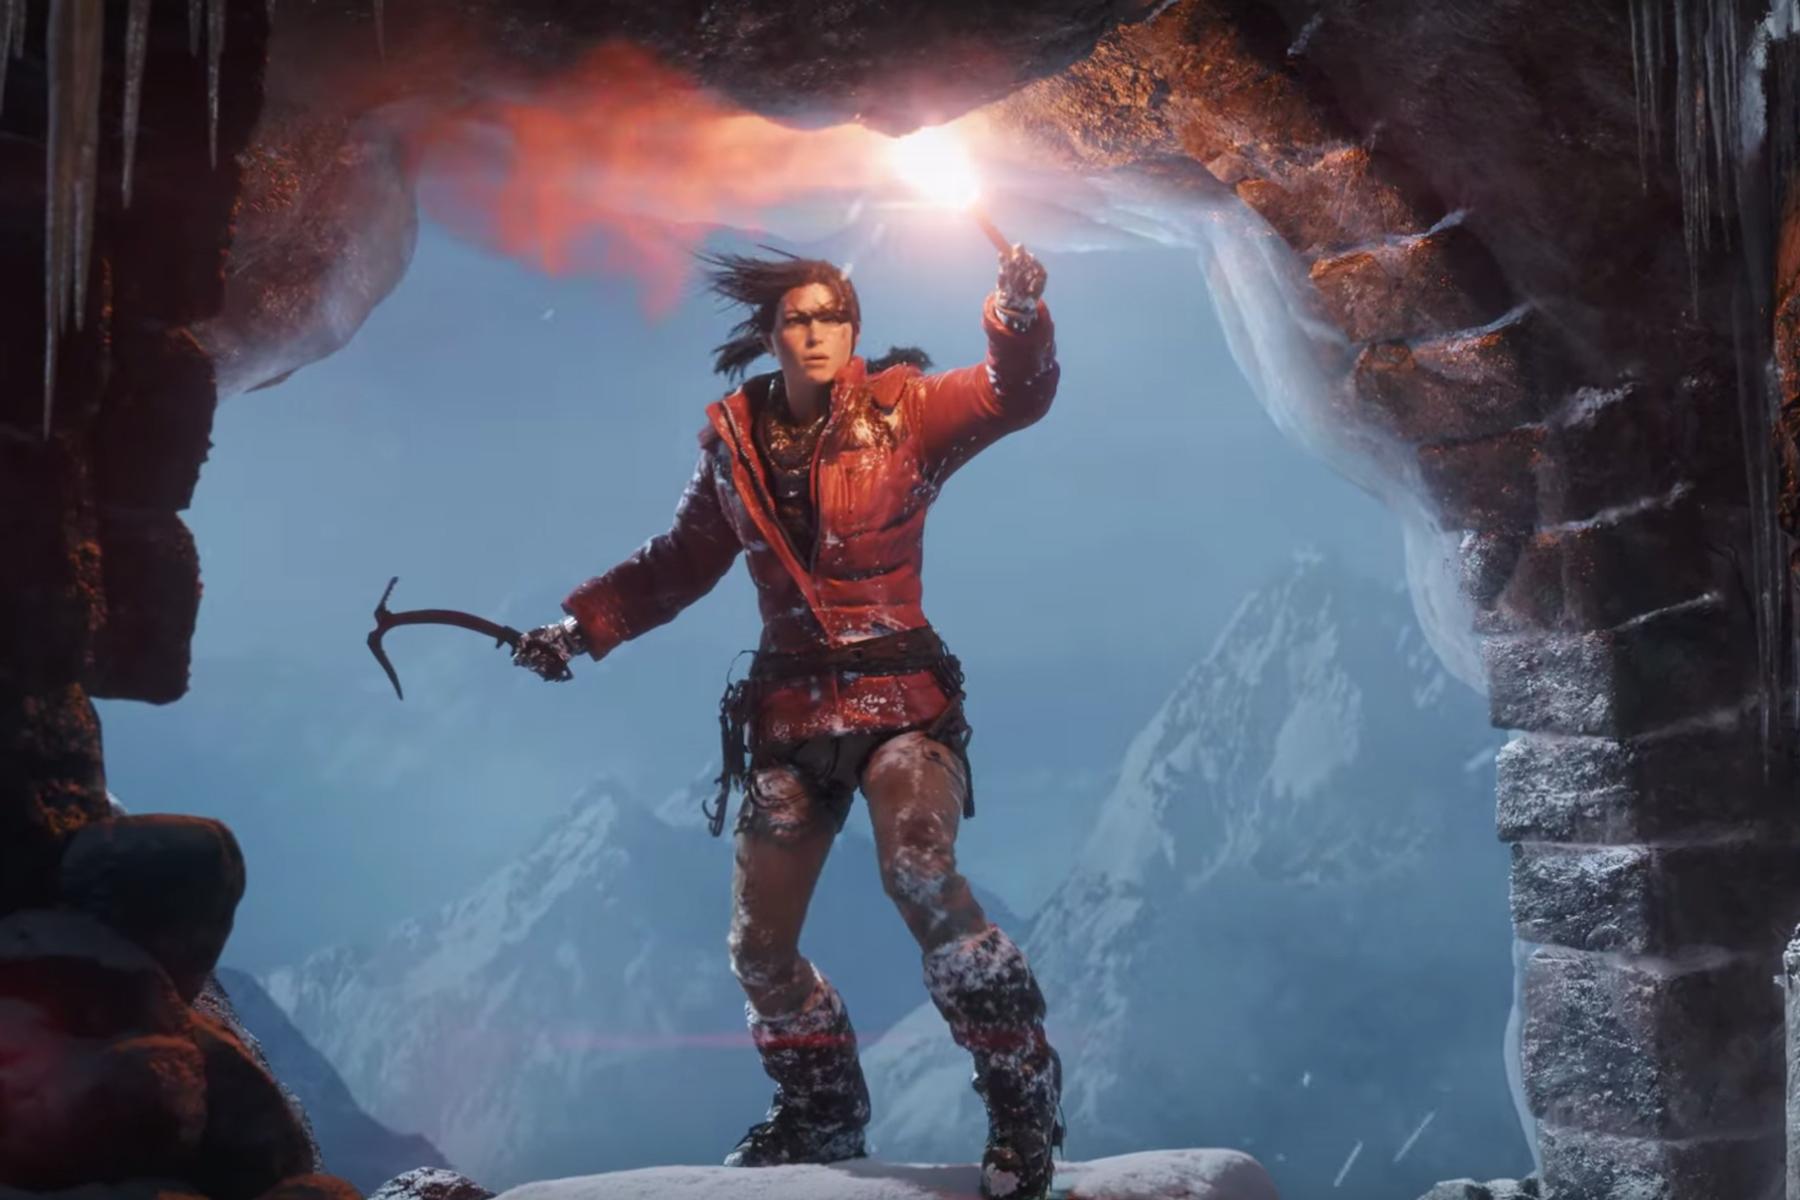 Lara Croft Returns in 'Rise of the Tomb Raider' Trailer